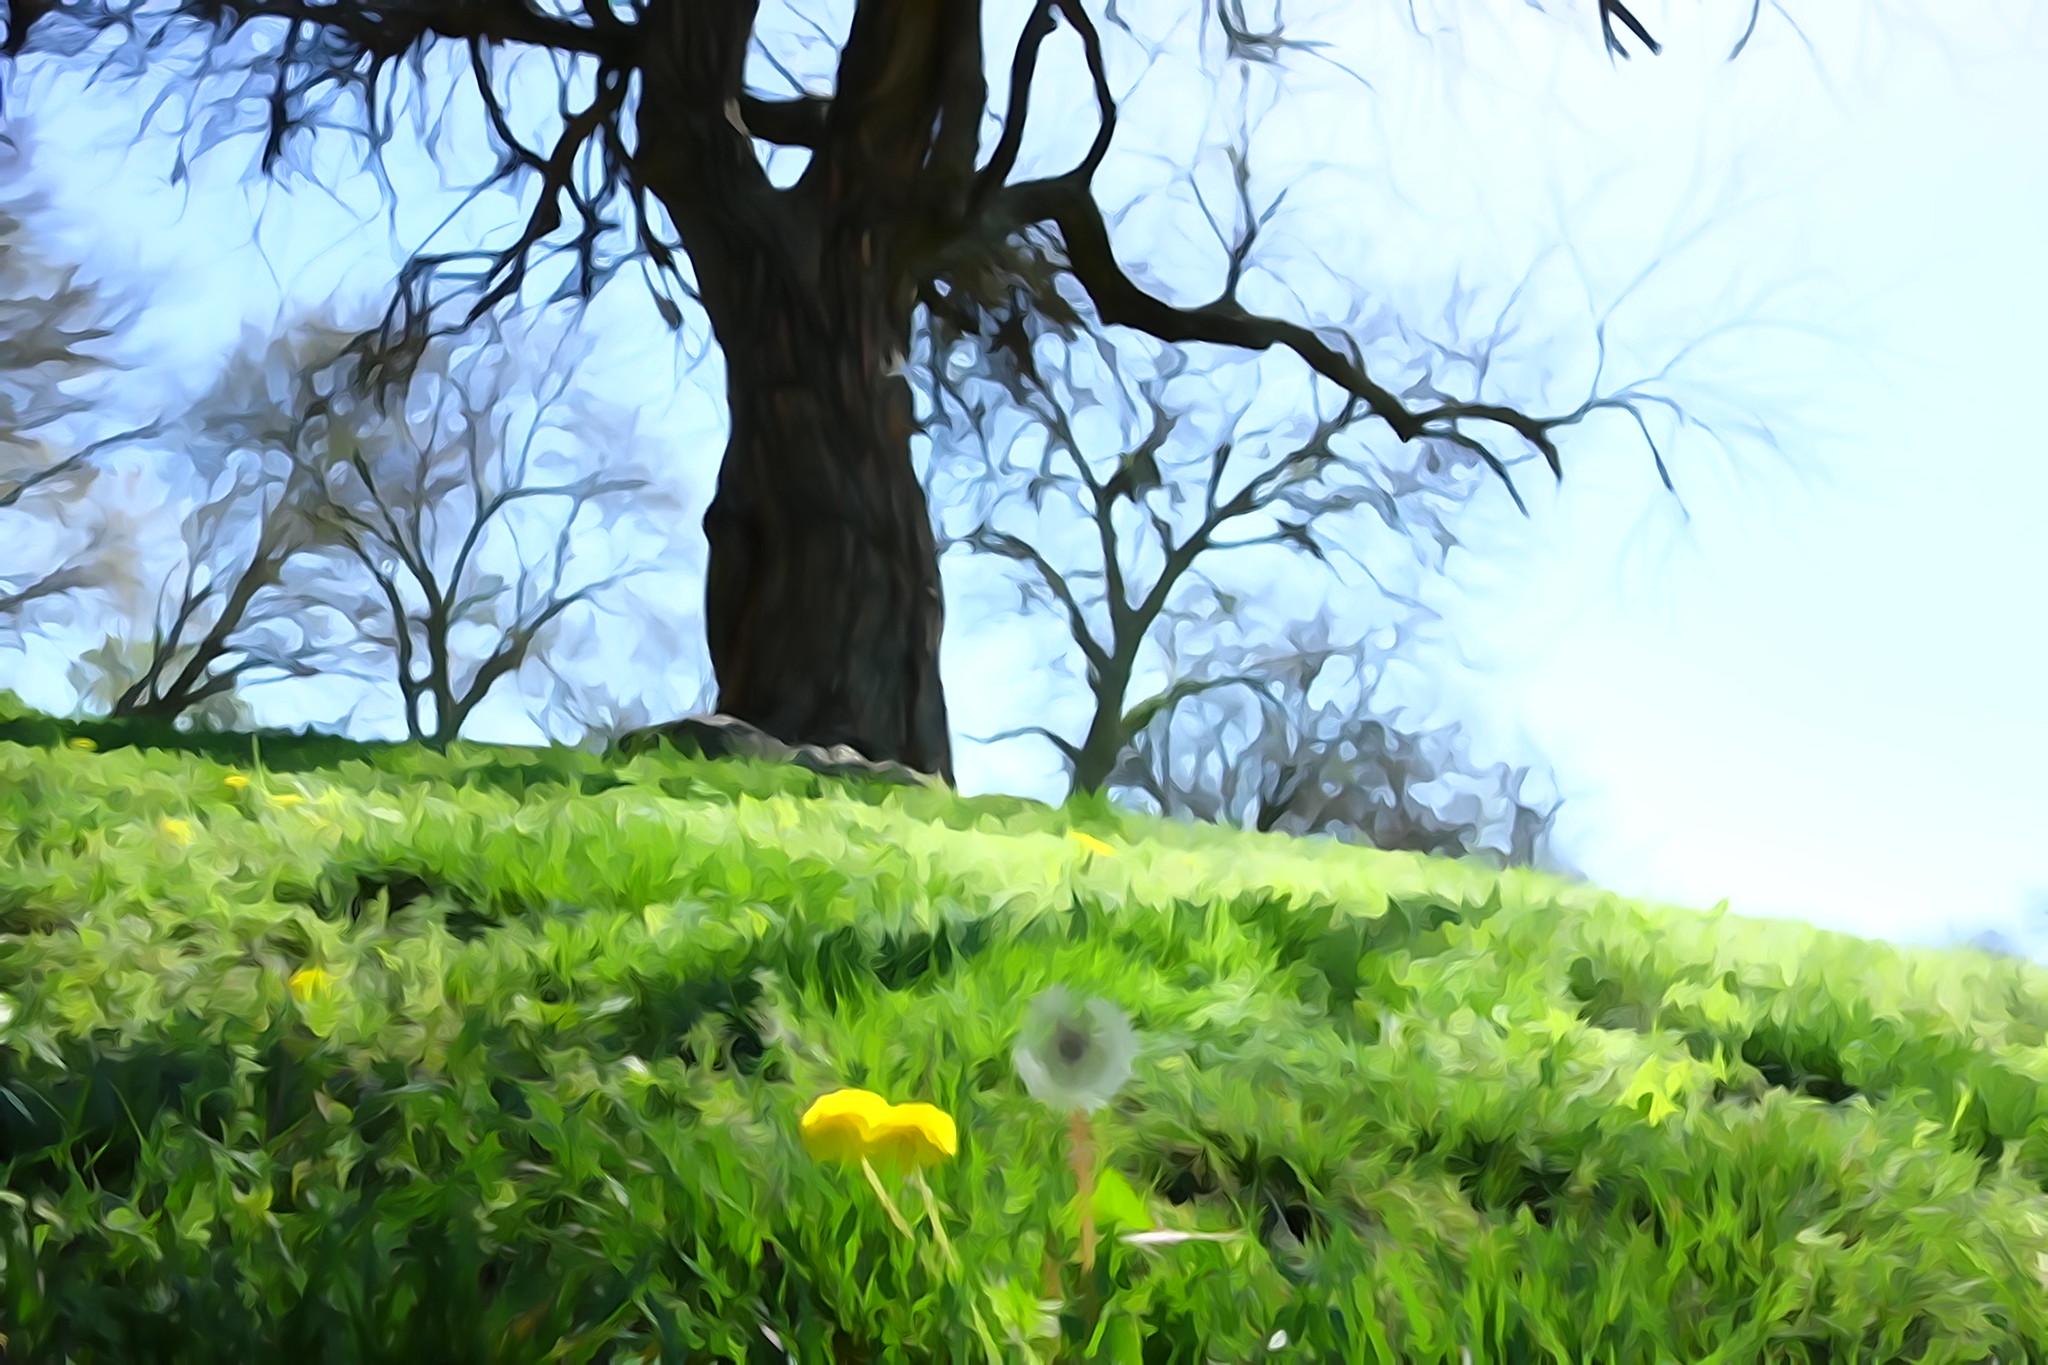 Chisholm tree